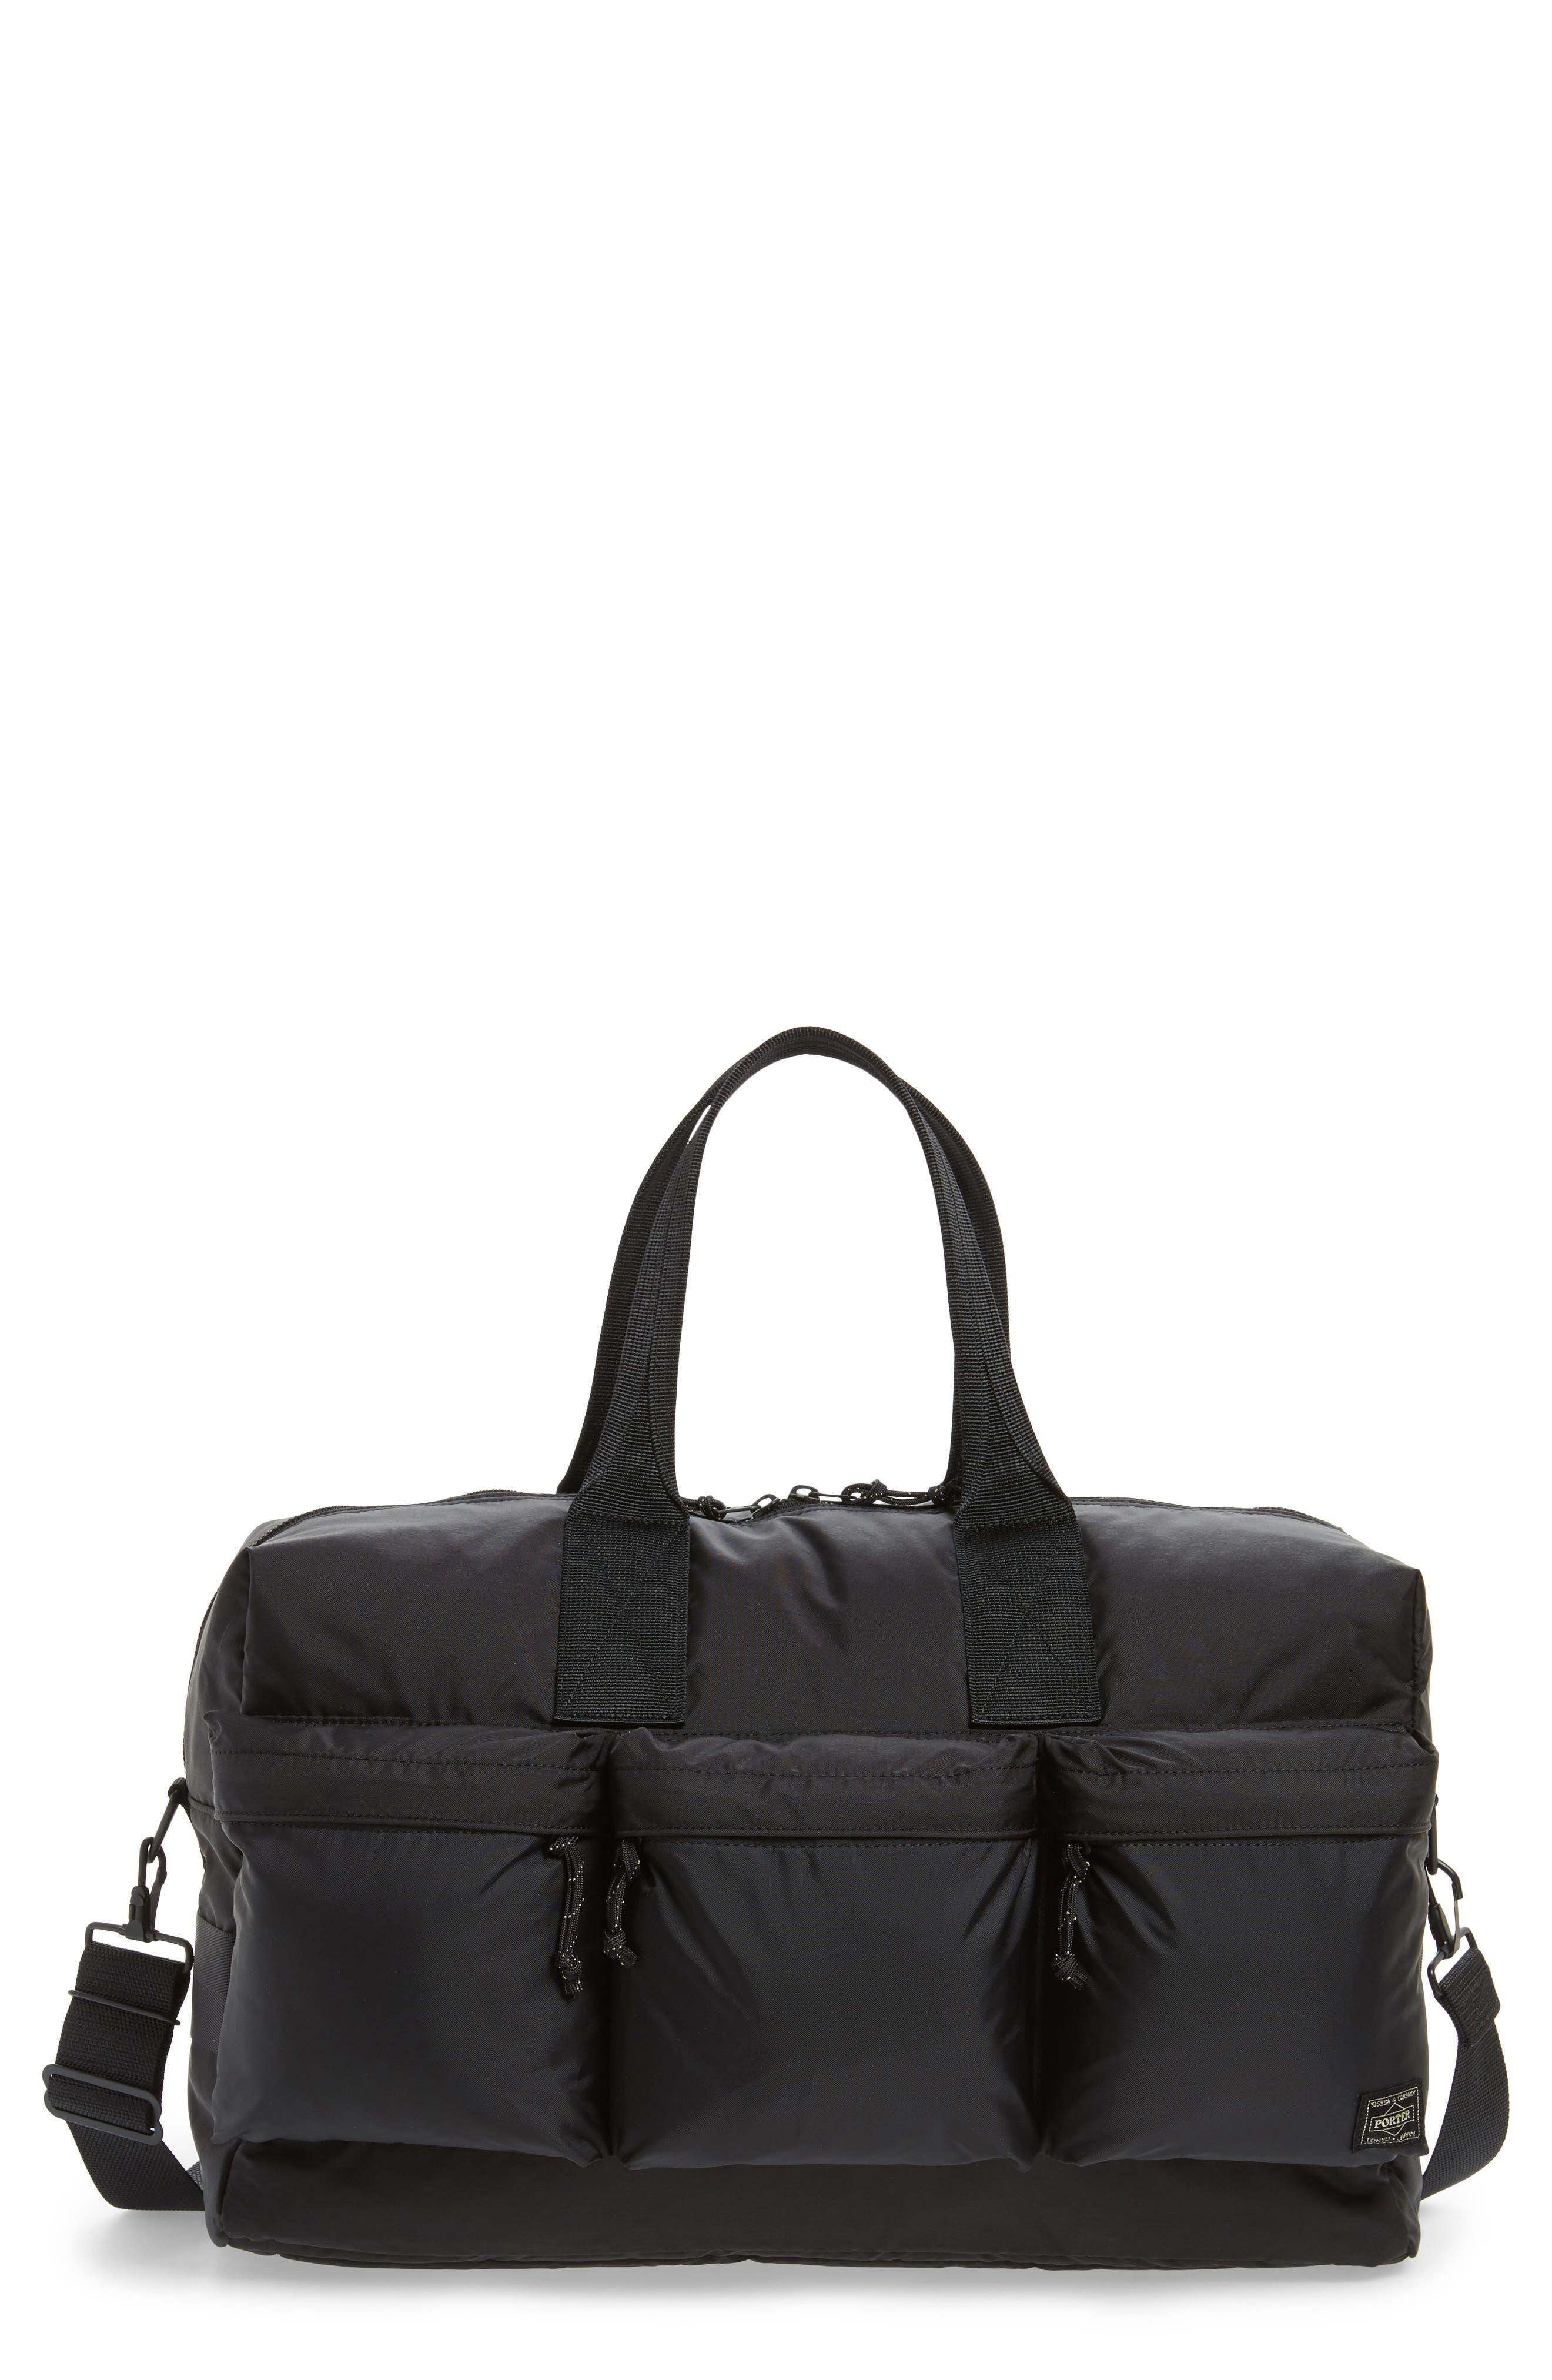 Porter-Yoshida & Co. Force Duffel Bag,                             Main thumbnail 1, color,                             Black